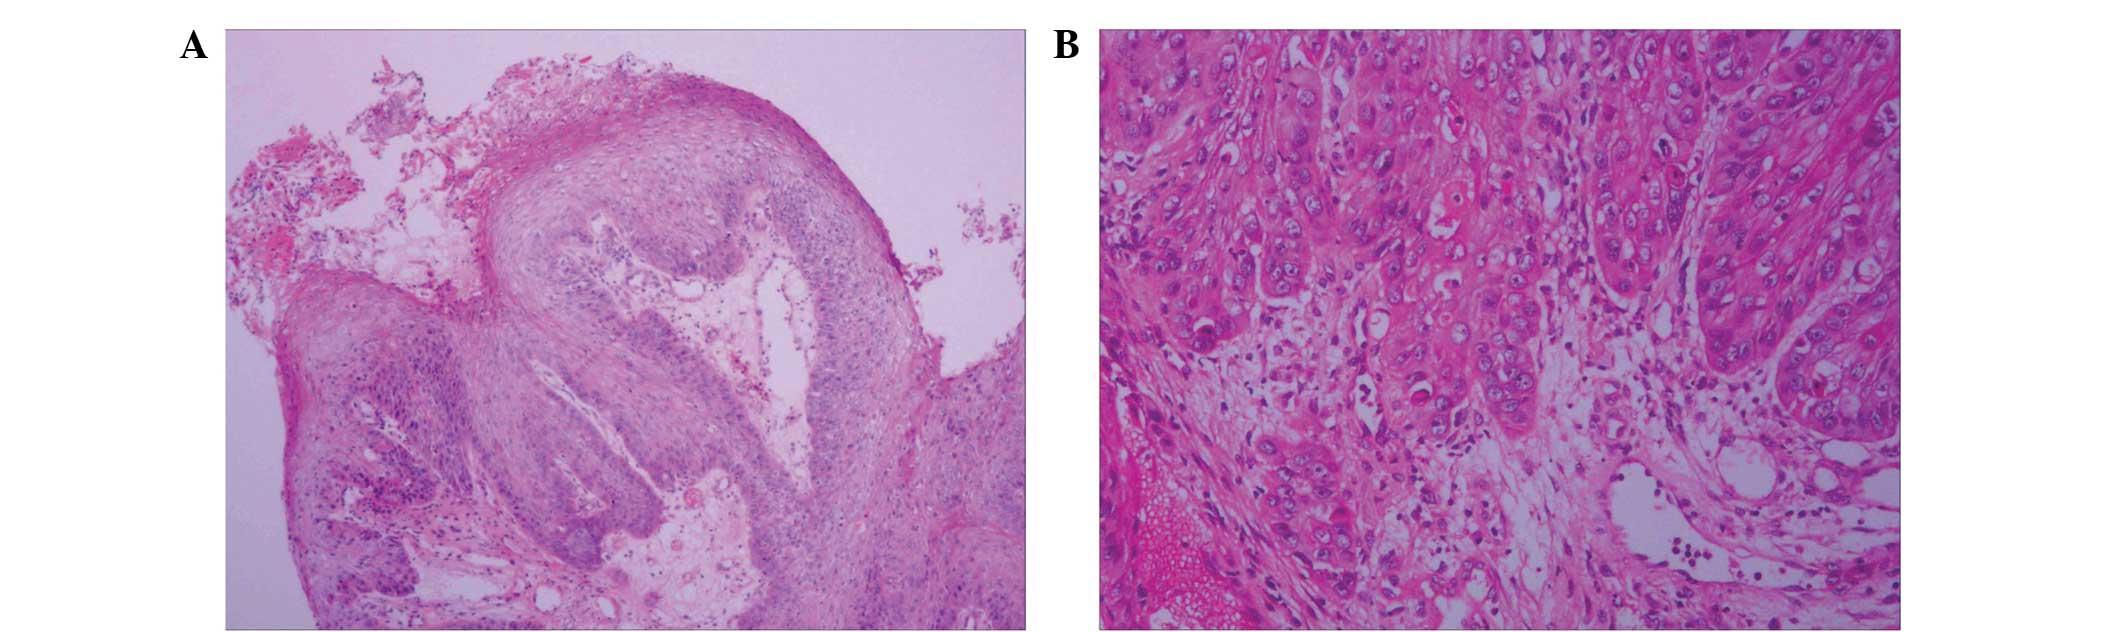 papillomatosis cancer definition